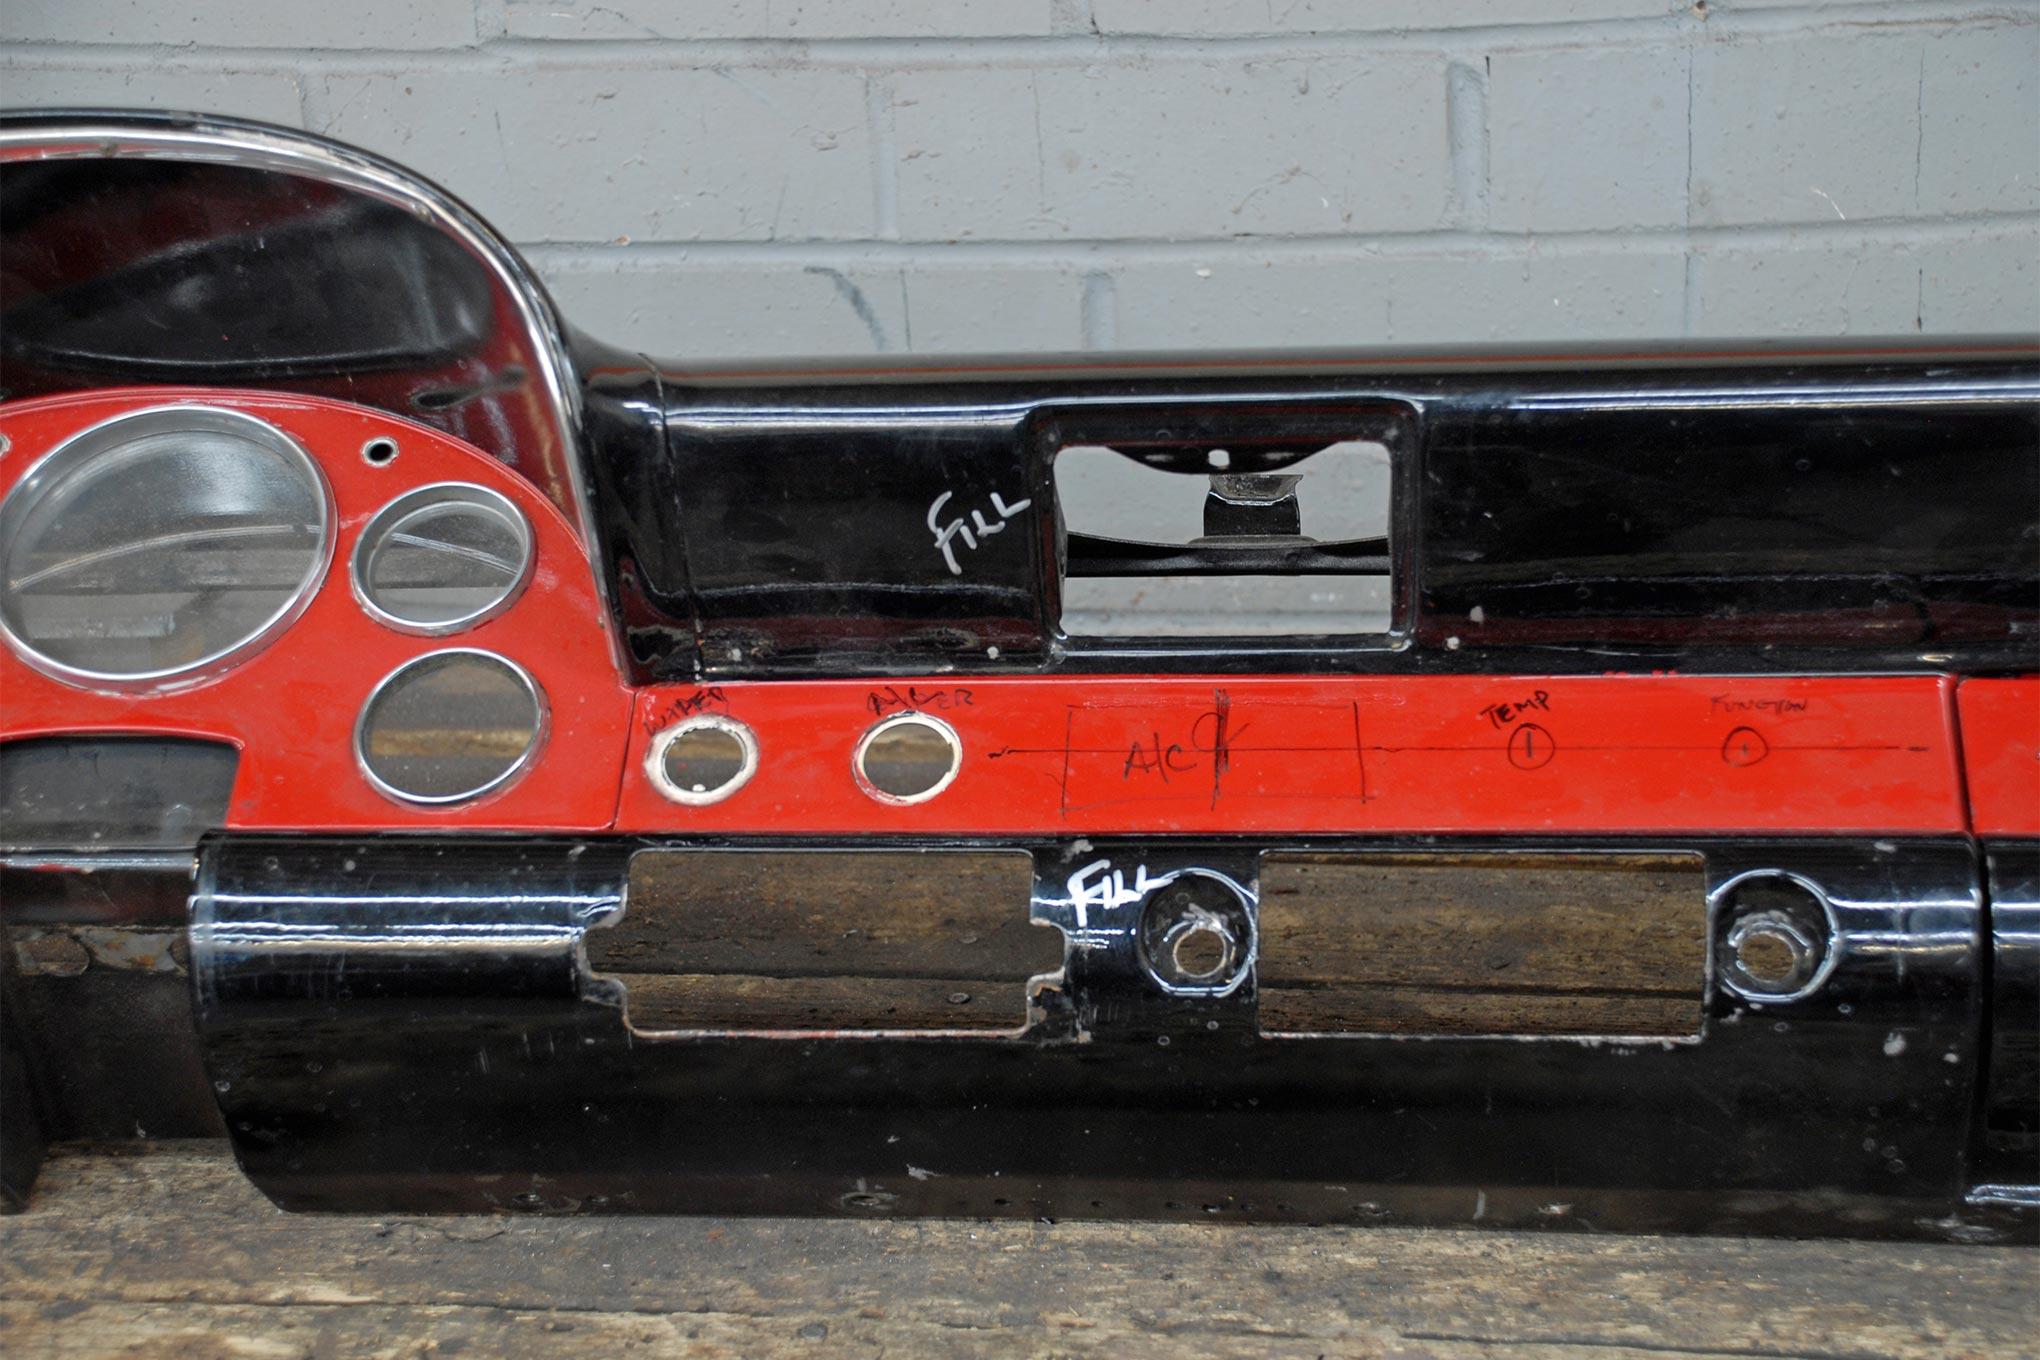 1956 Ford Fairlane Victoria Dashboard Gets The Custom